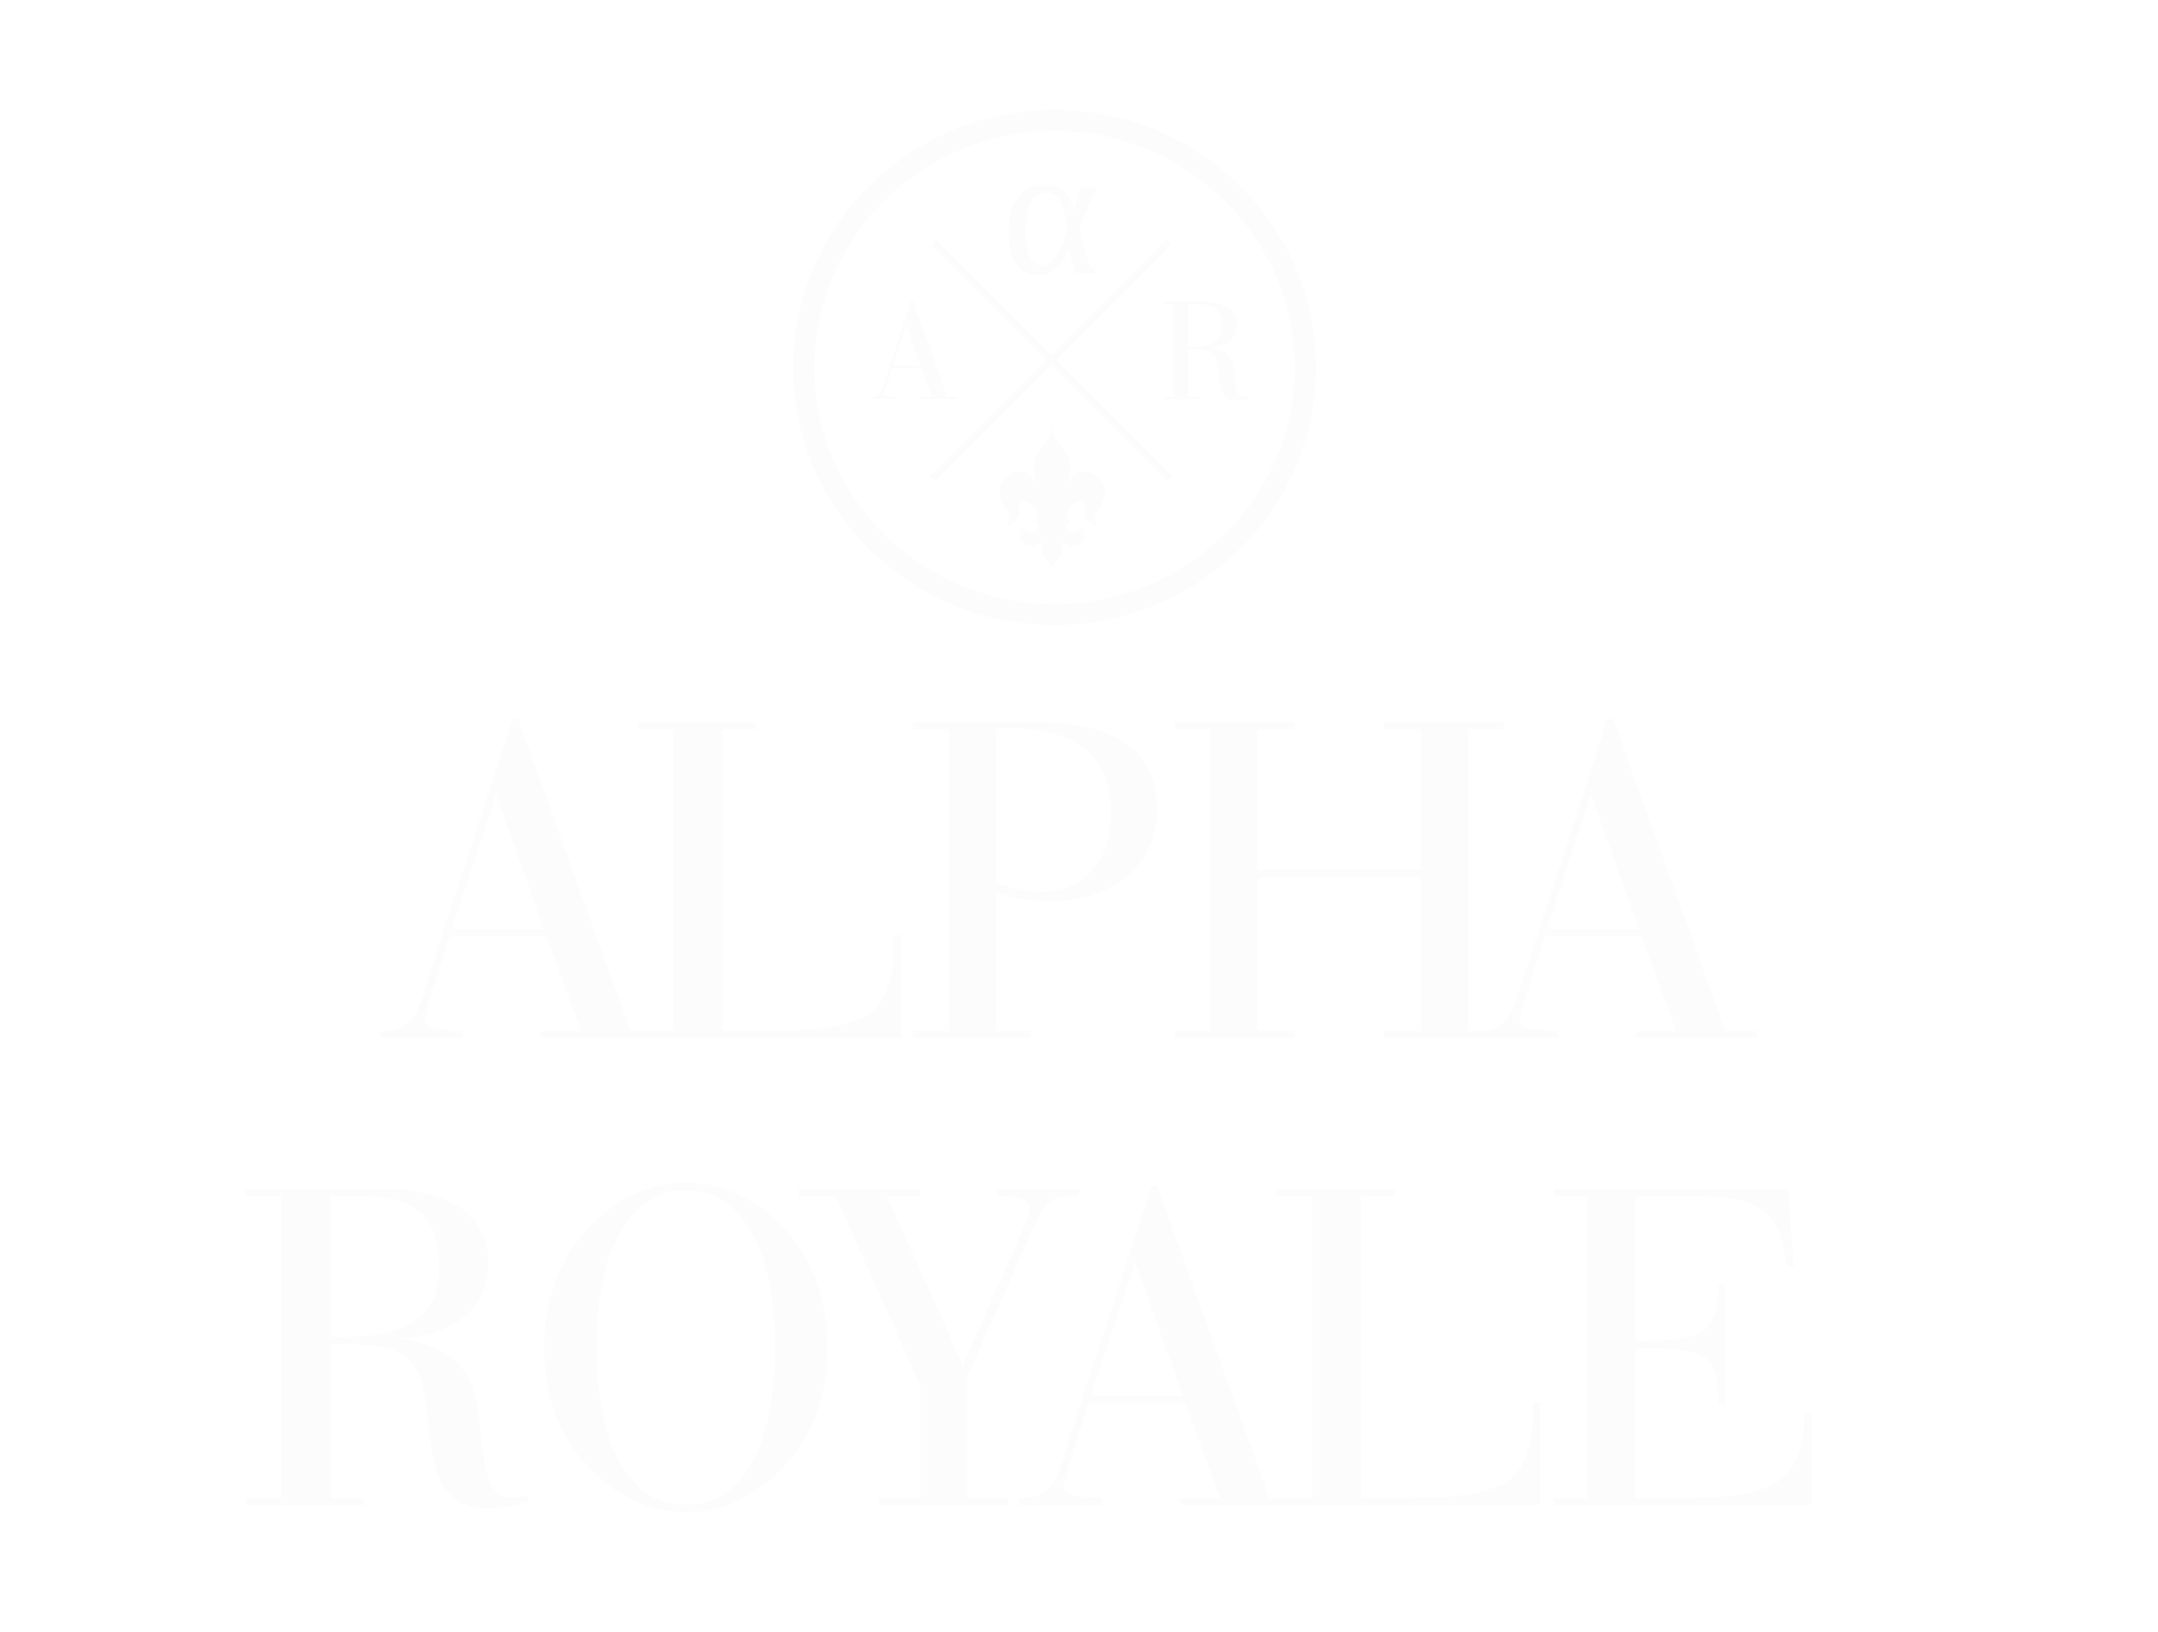 Alpha Royale